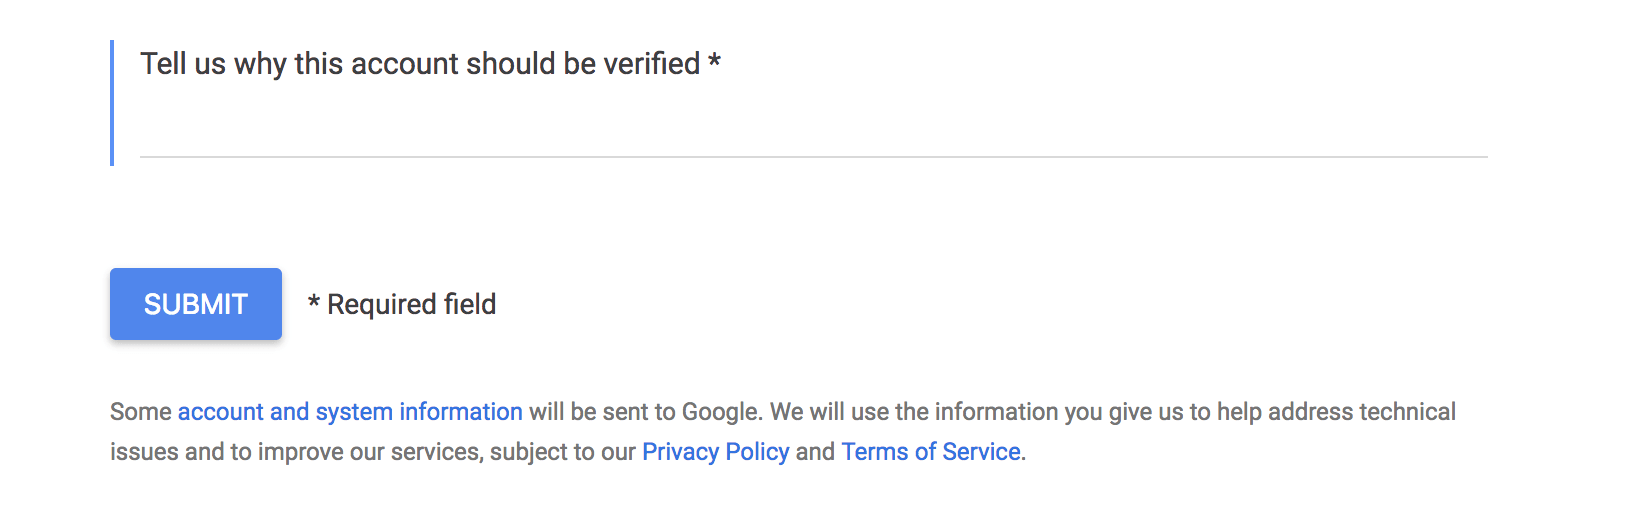 Google knowledge panel why verified